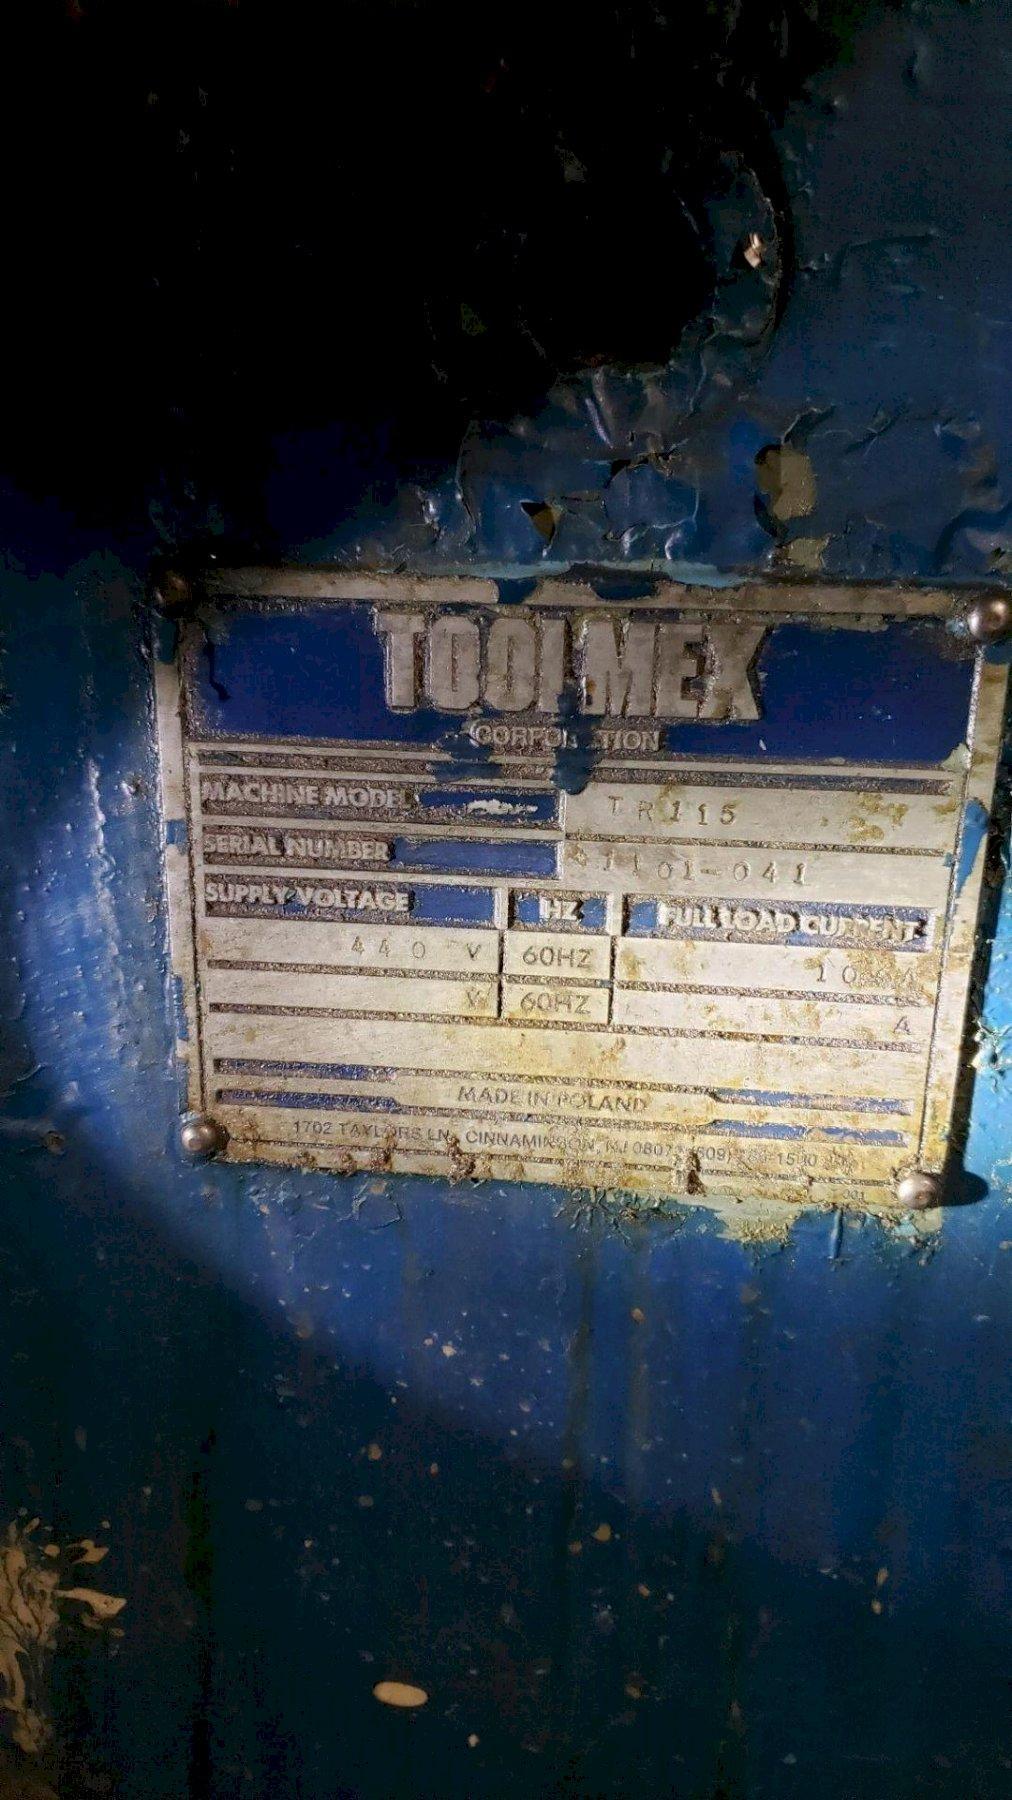 "45"" X  324"" POREBA TR115 ENGINE LATHE. STOCK # 0418021"